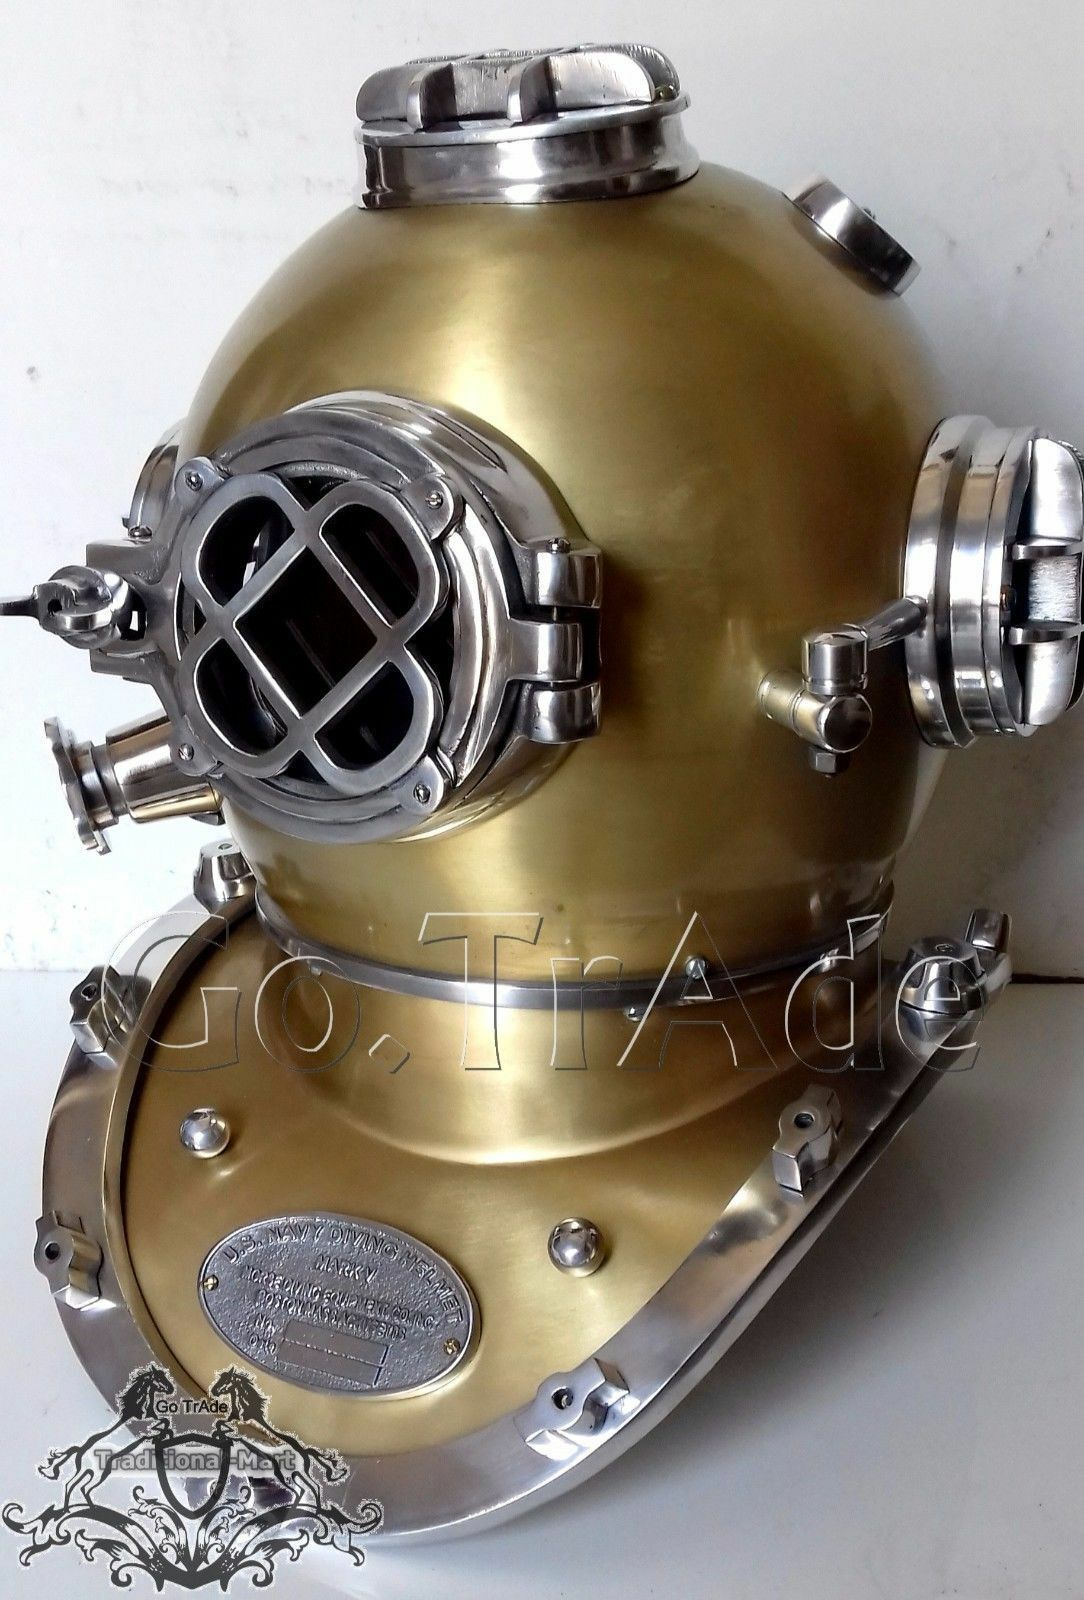 Vintage Antique Morse U.S Navy Diving Divers Helmet Solid Steel & Aluminium Gift